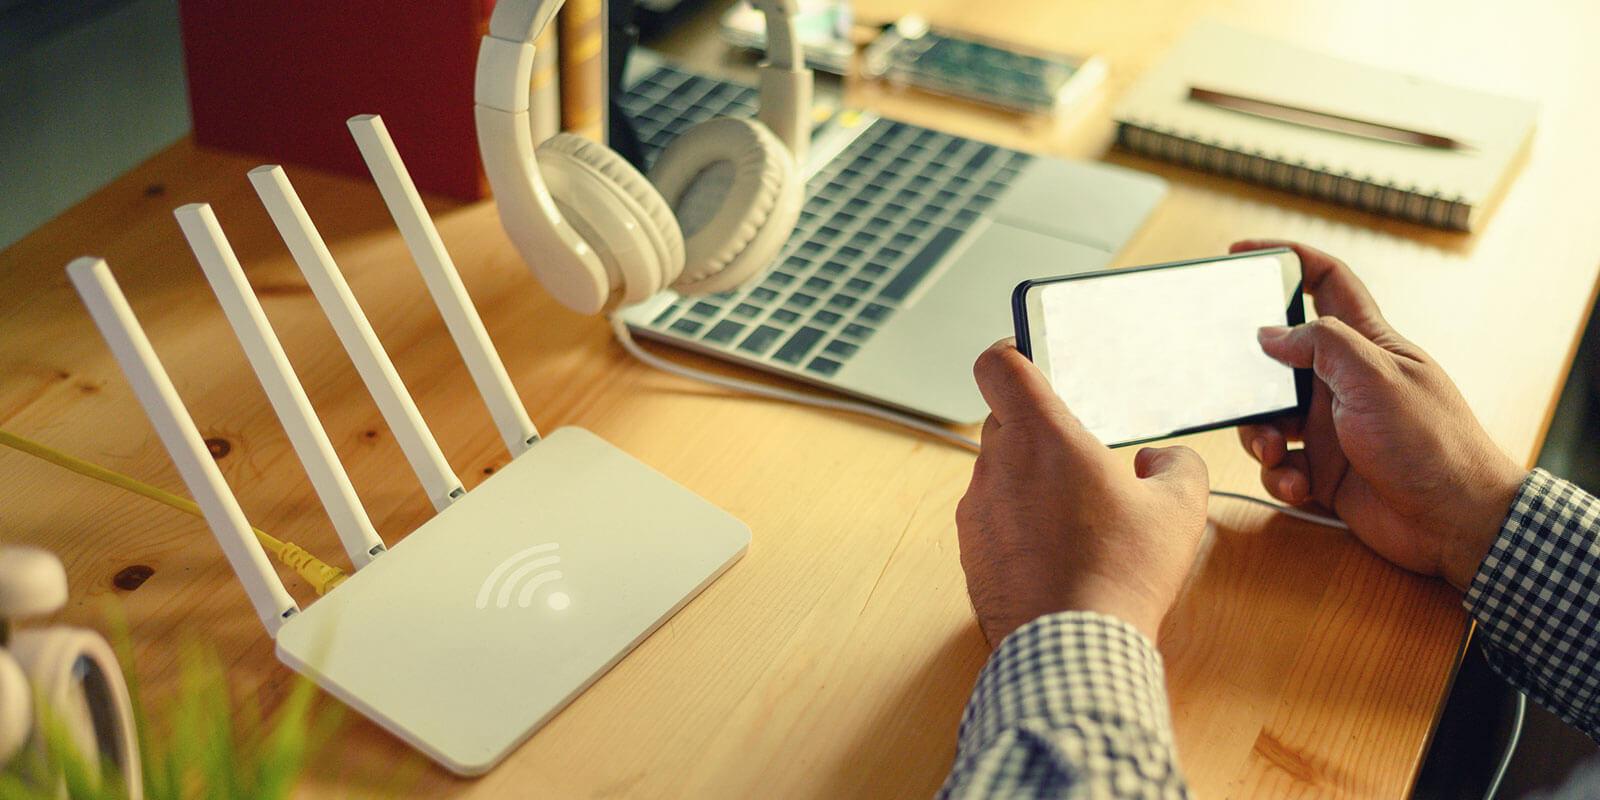 Free Wi-Fi Hotspots 2020